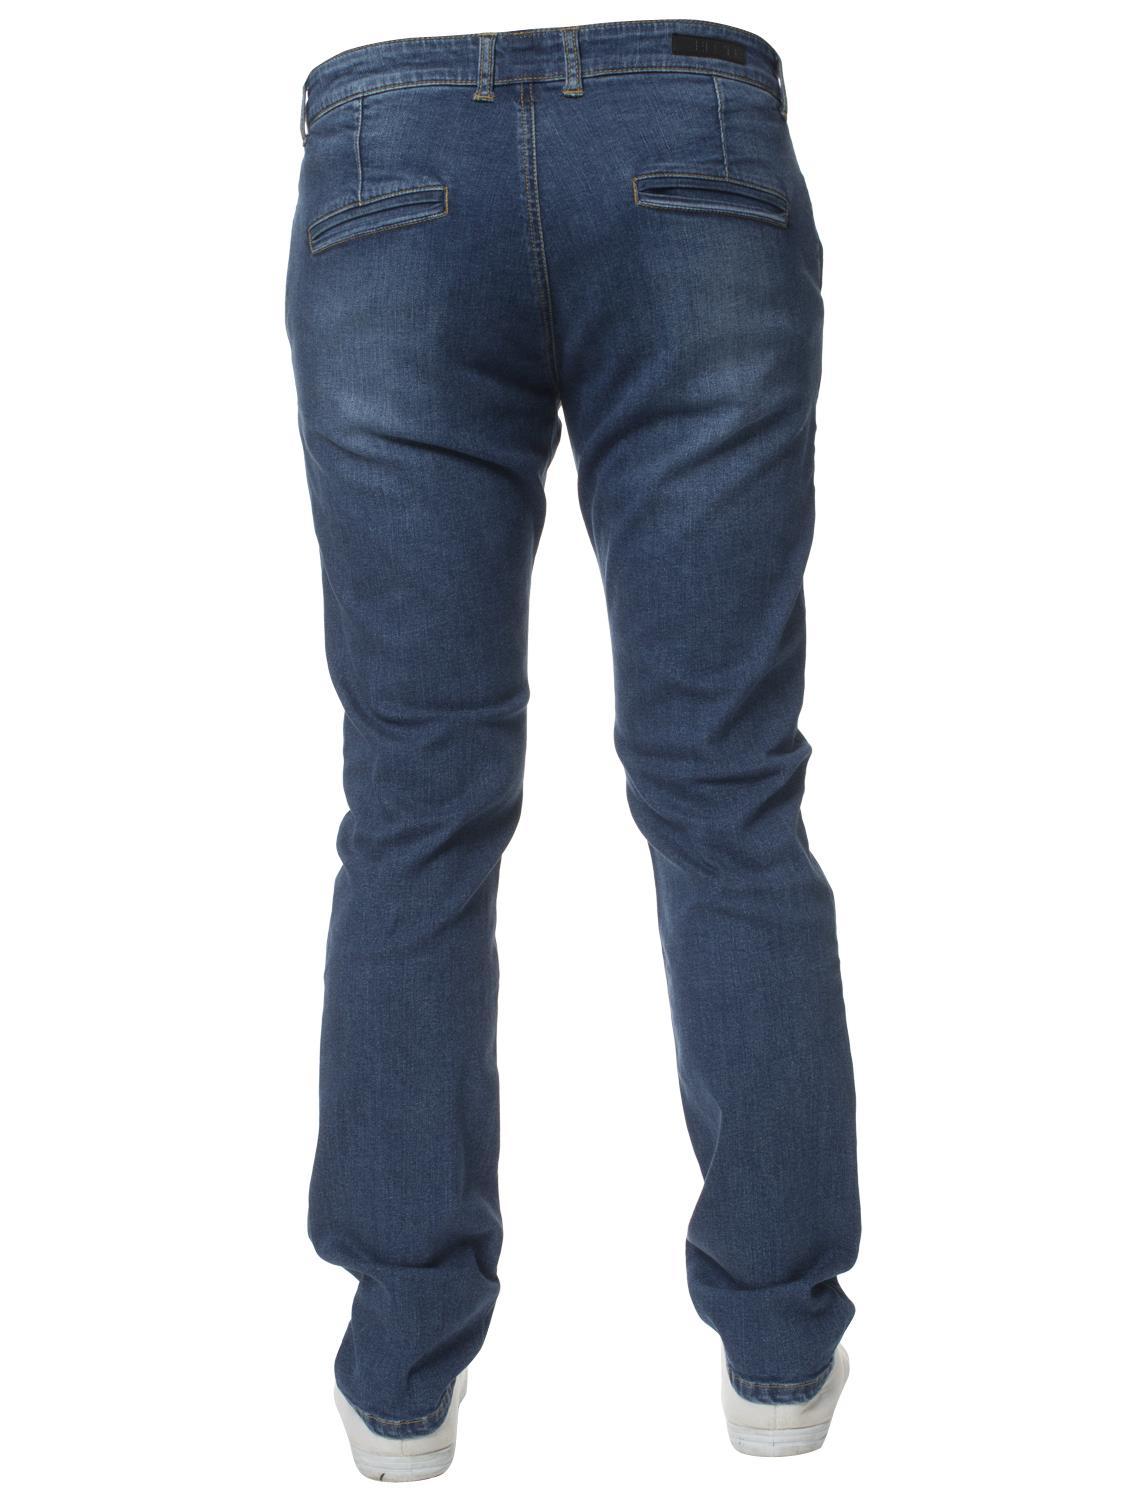 ENZO-Jeans-para-hombre-Big-Alto-Pierna-King-Size-Jeans-Pantalones-Chino-Pantalones-Pantalones-44-034 miniatura 33